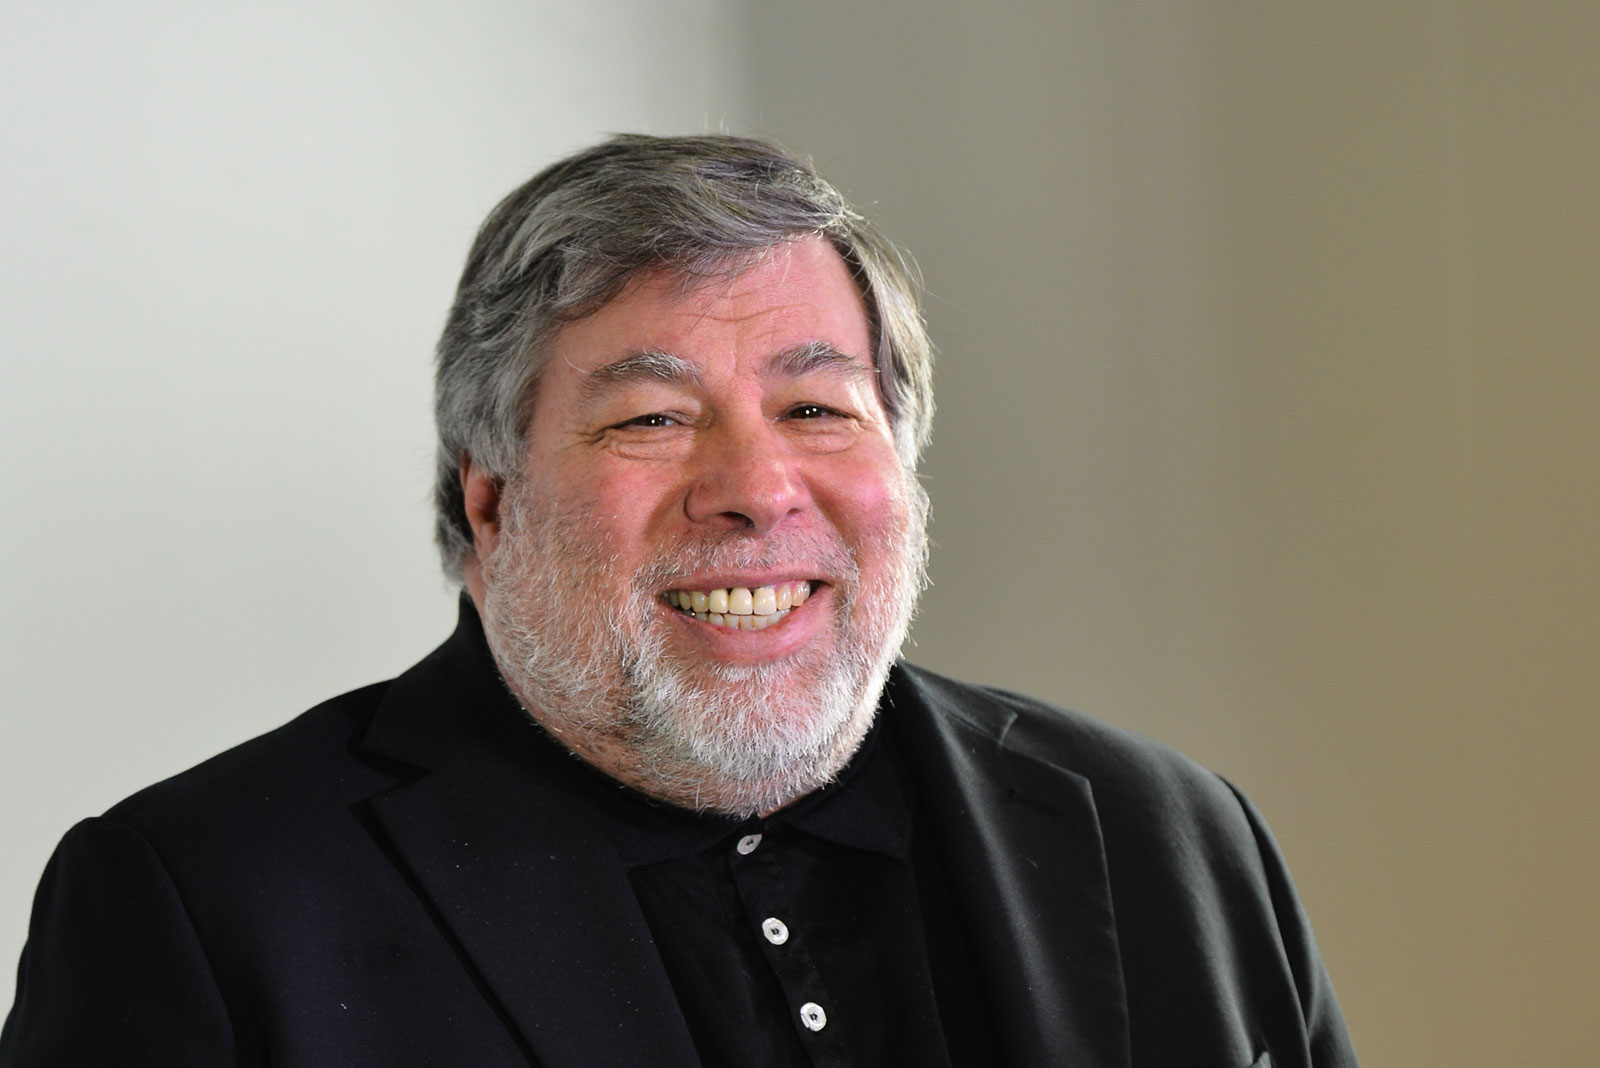 Wozniak Net Worth 2020, Biography, Education and Career.